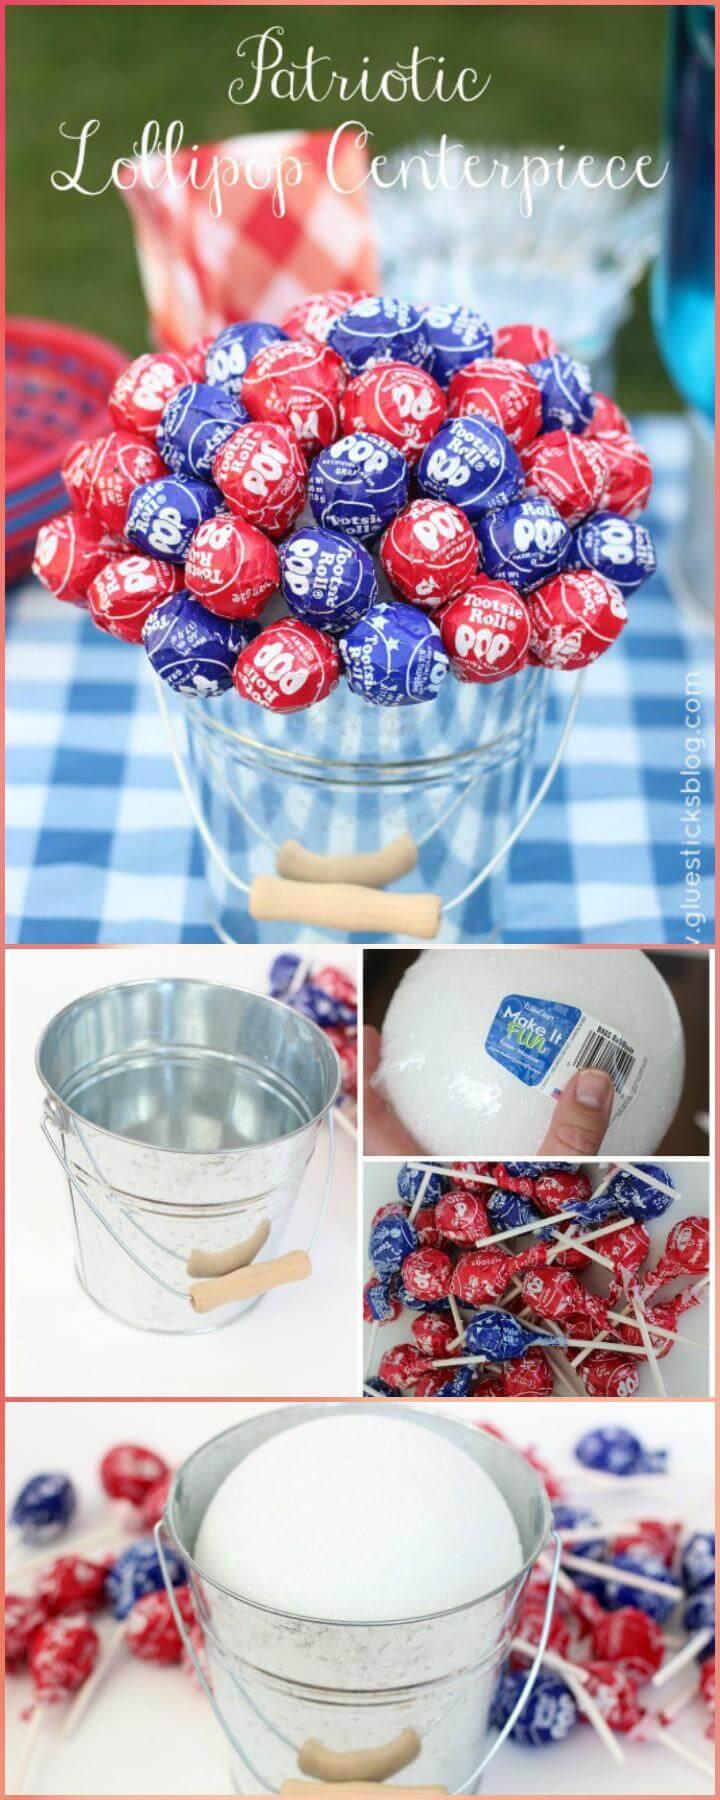 20 DIY Patriotic Lollipop Centerpiece